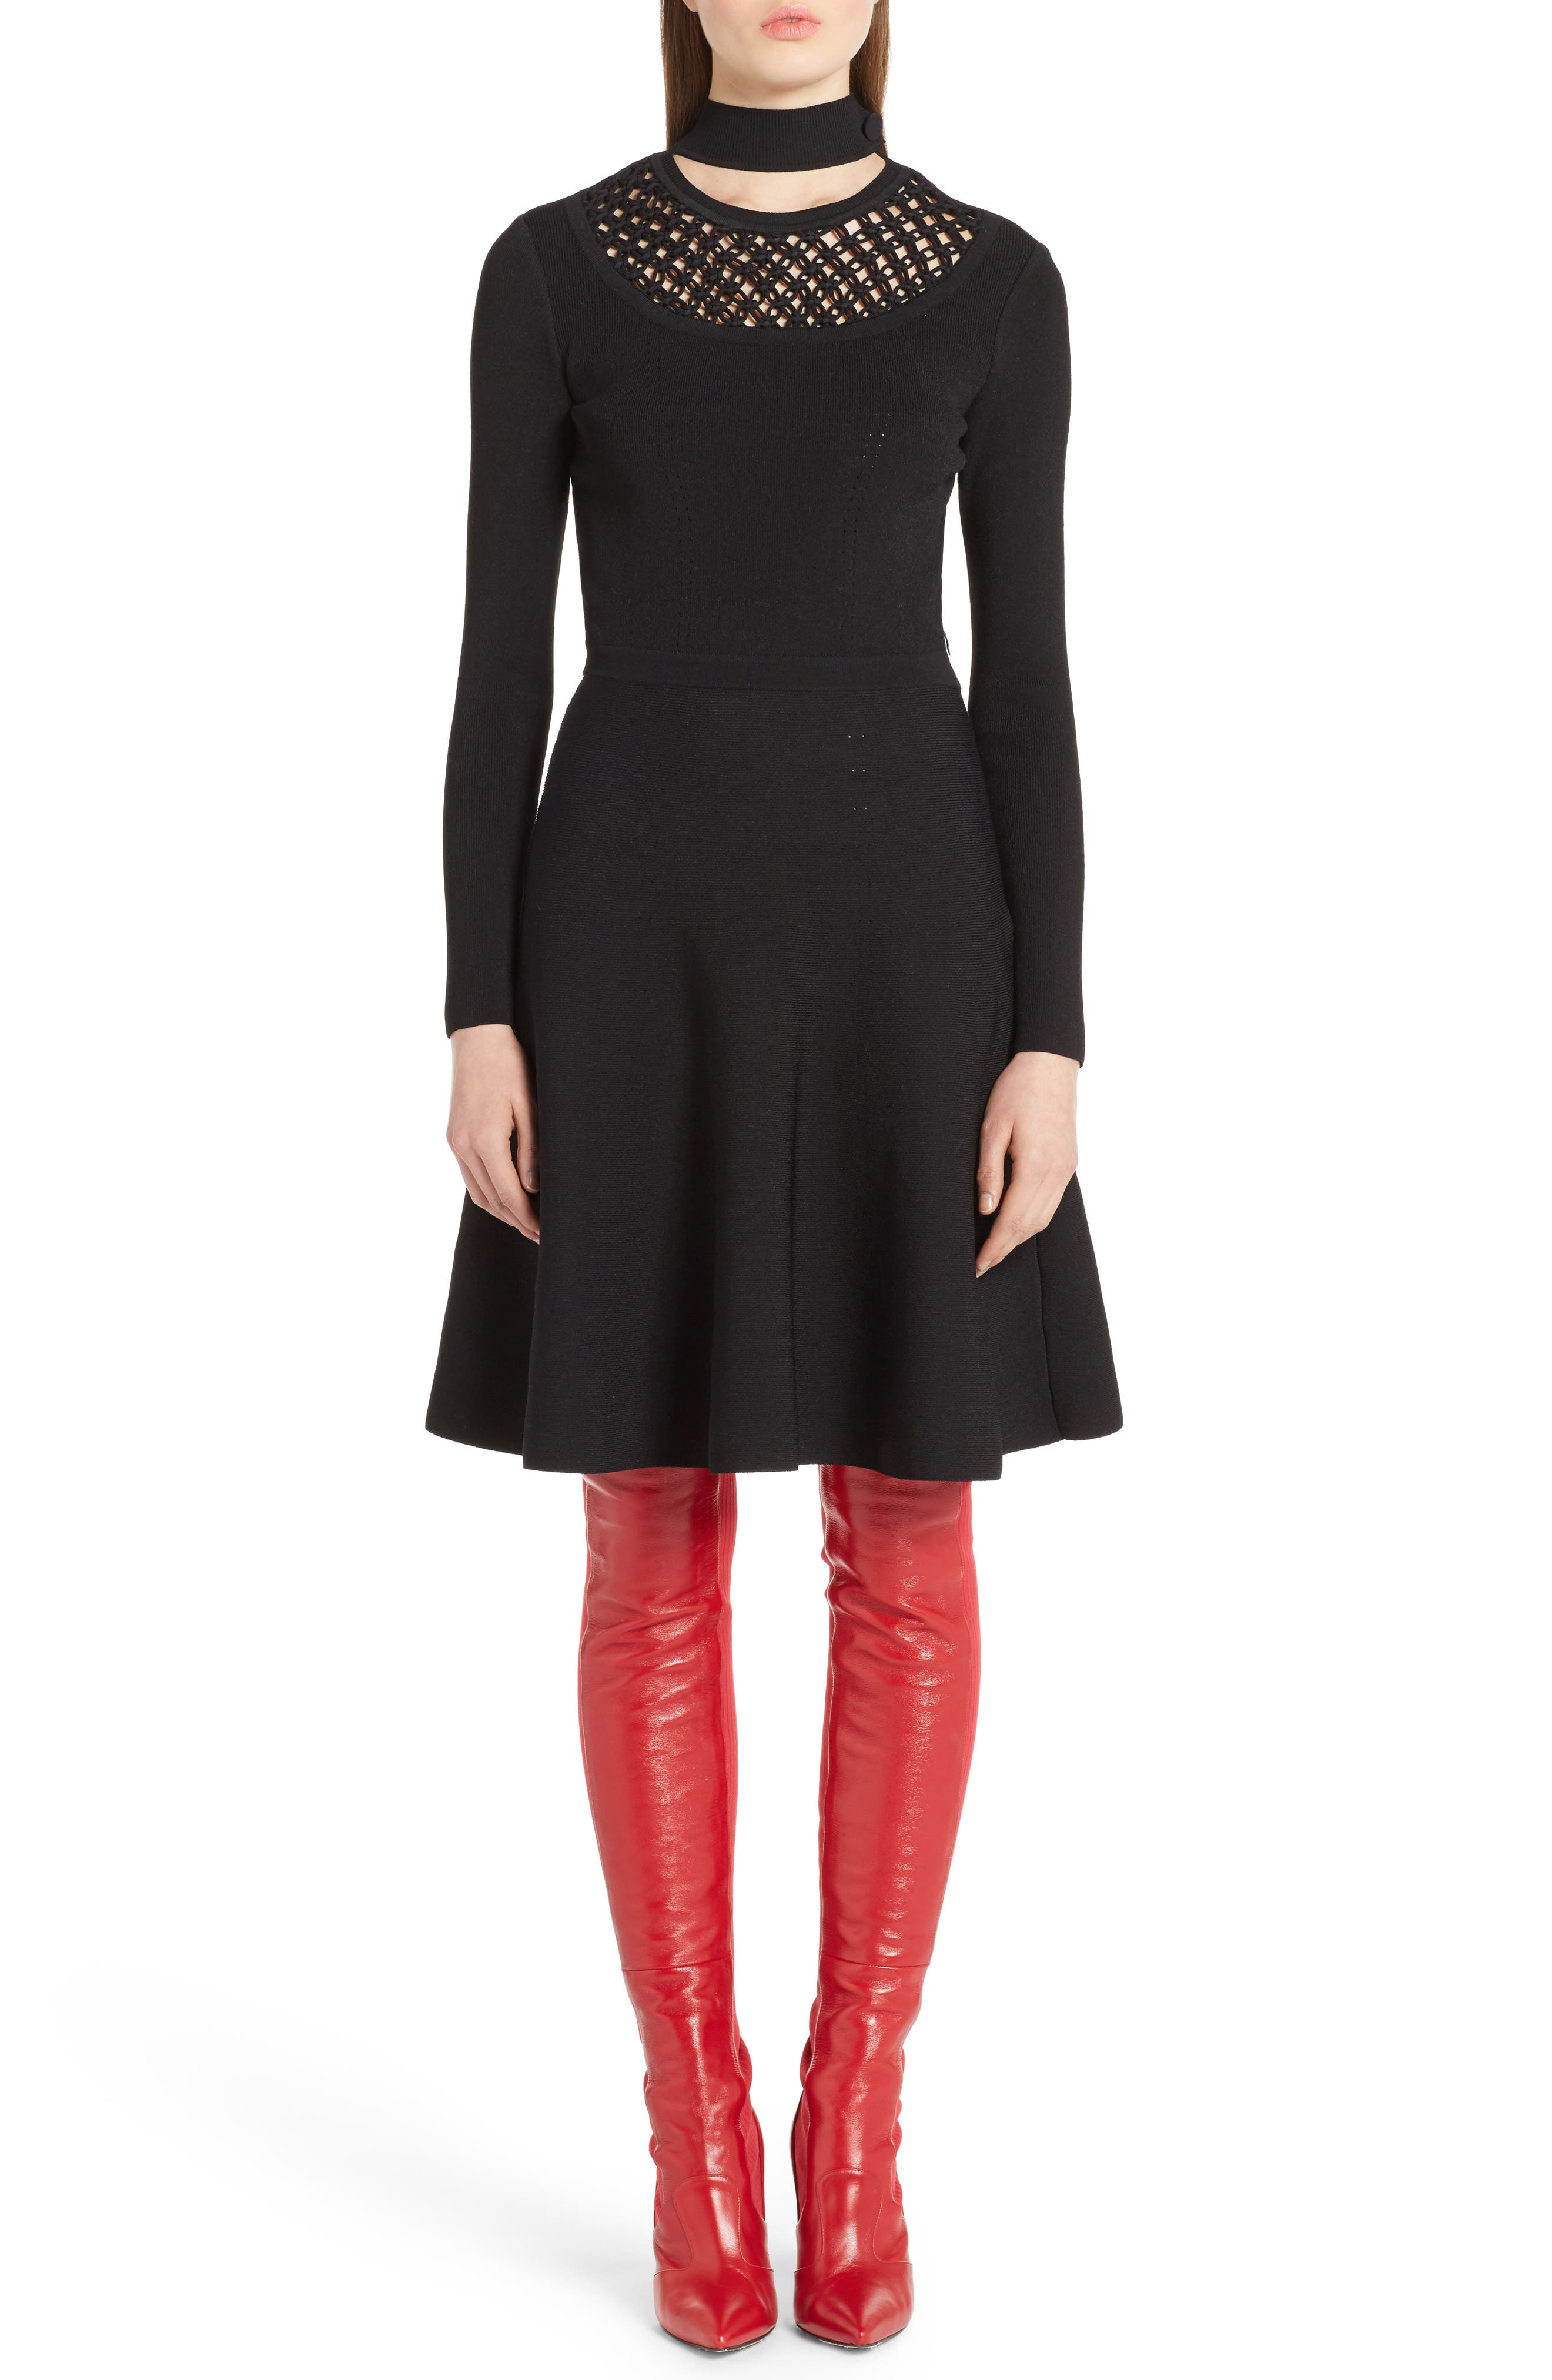 Alternate Image 1 Selected - Fendi Macramé Inset Knit Dress